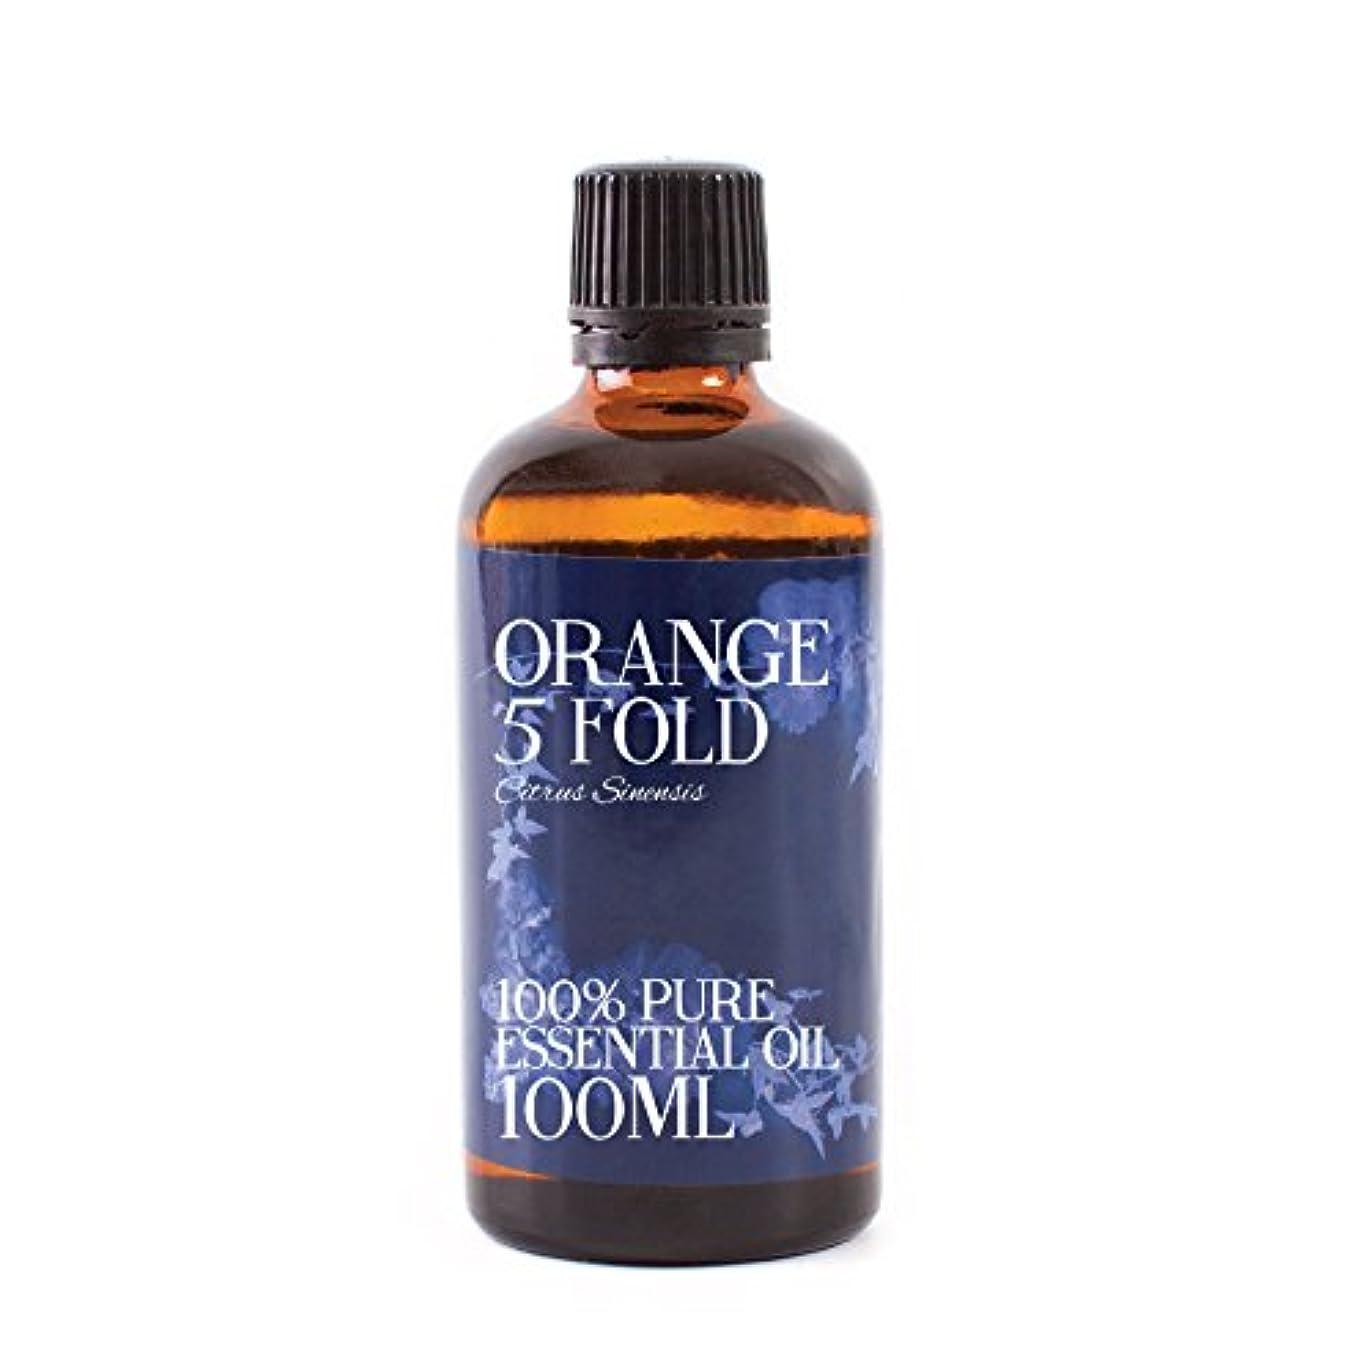 会話海洋聖域Mystic Moments | Orange 5 Fold Essential Oil - 100ml - 100% Pure